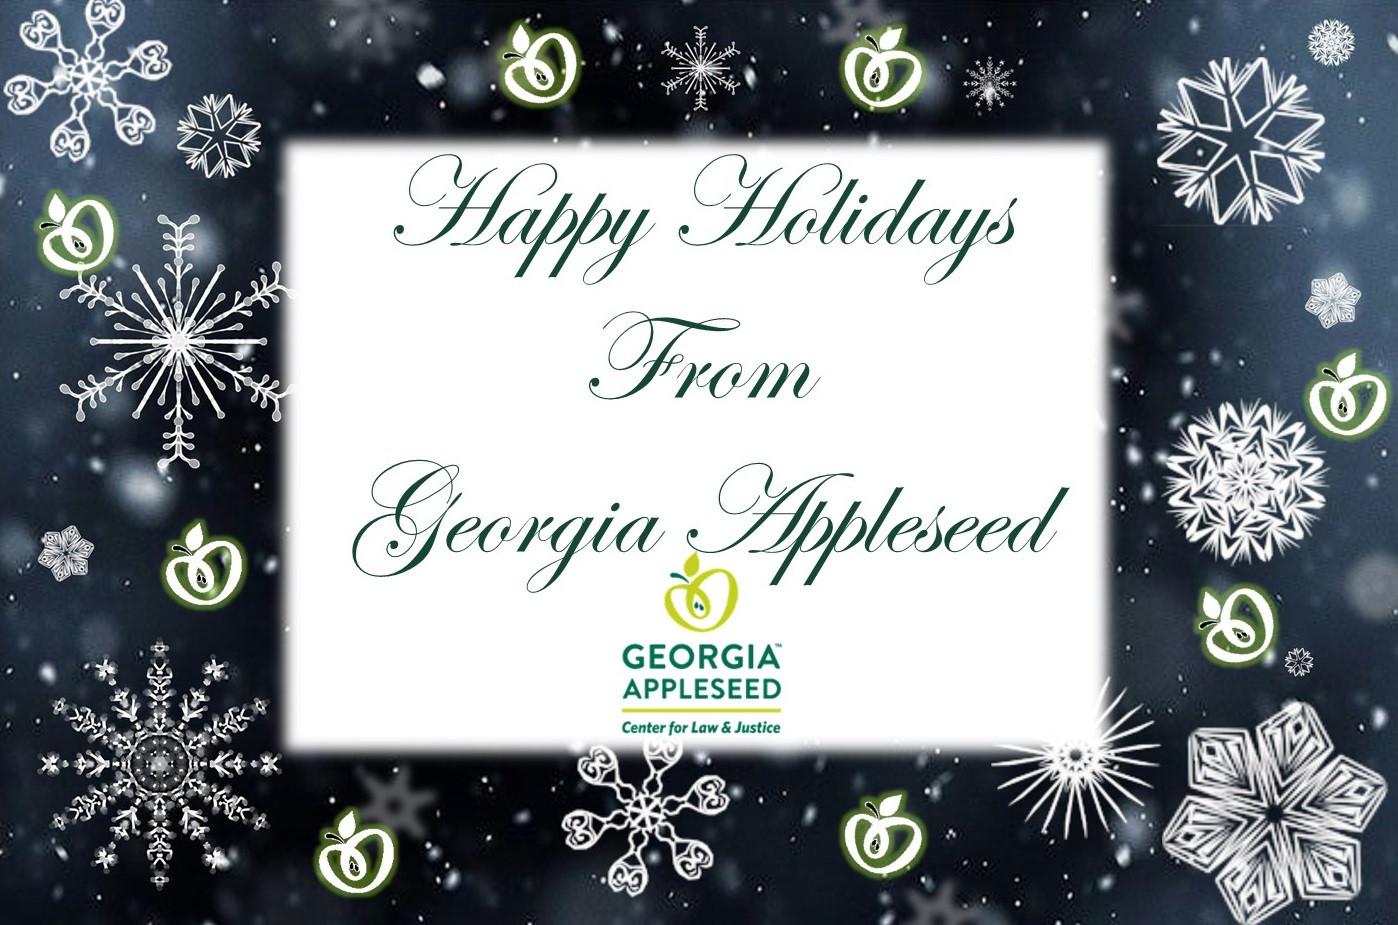 Happy Holidays postcard.jpg